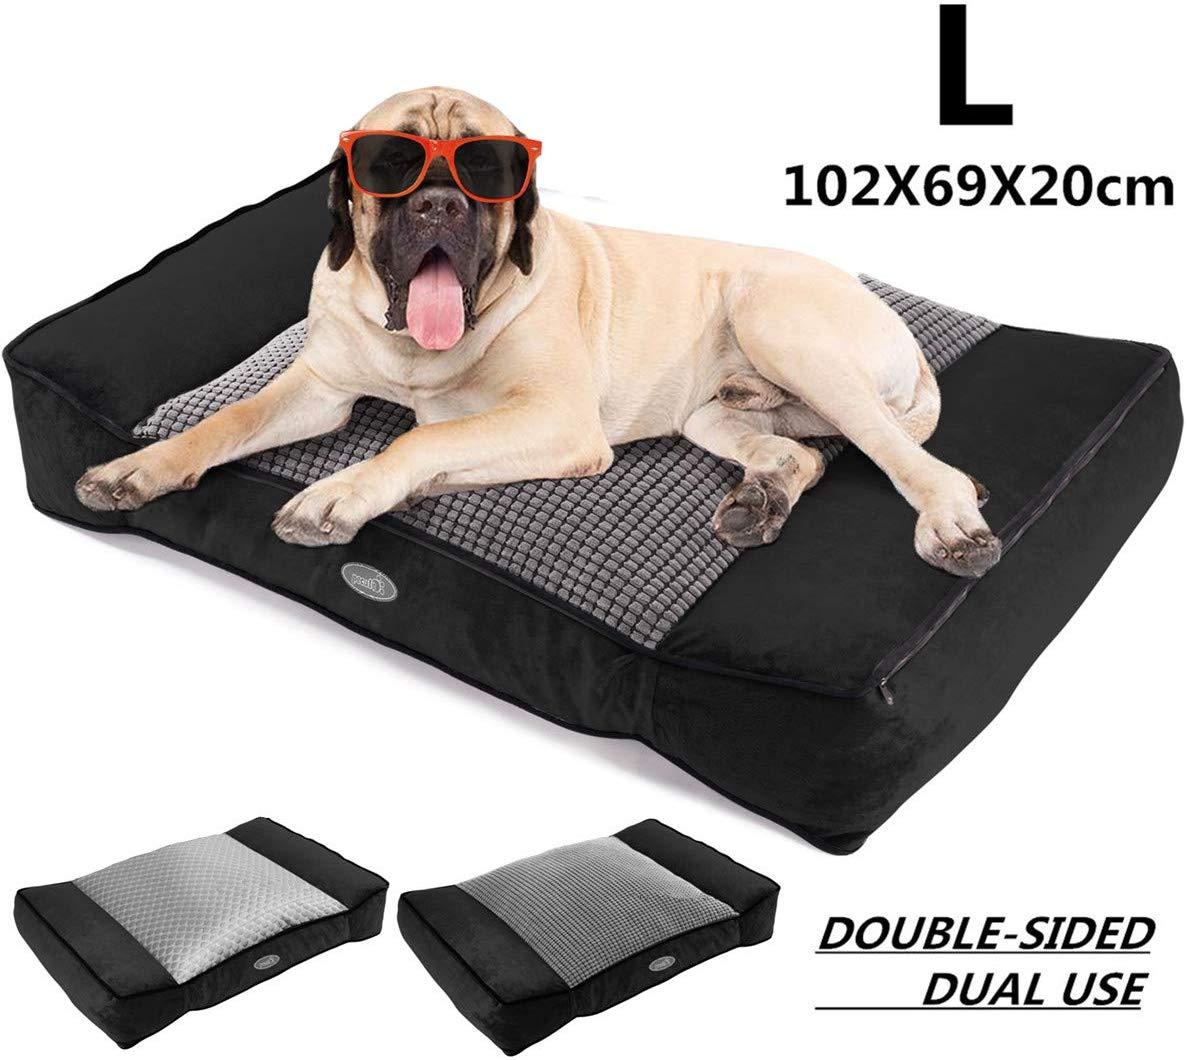 Nice quality dog bed